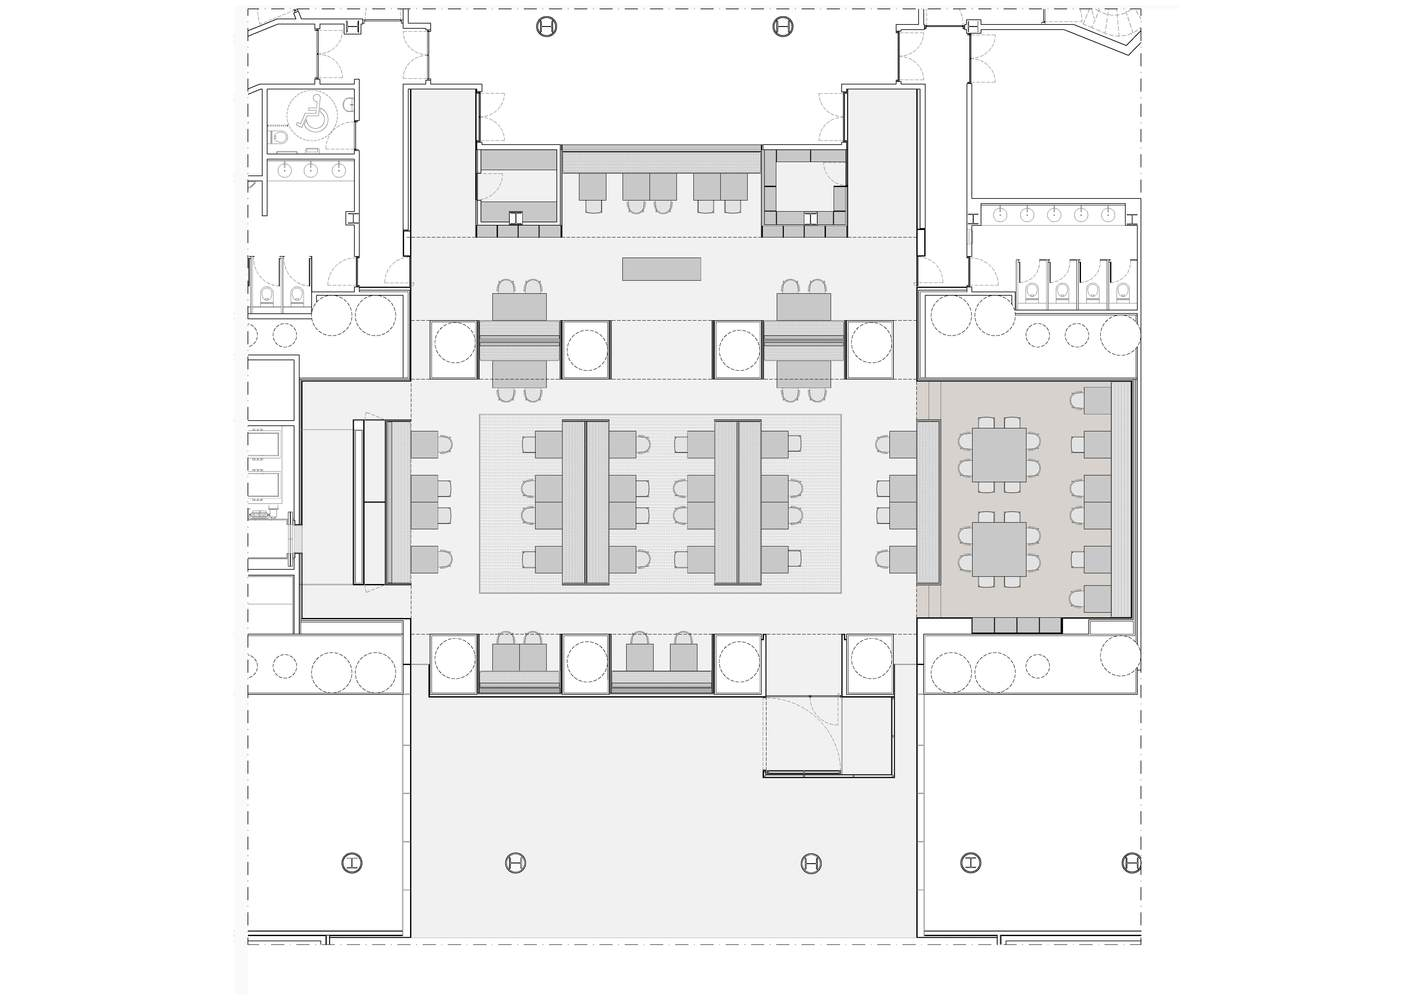 gallery of habitual restaurant rife design 11 habitual restaurant floor plan